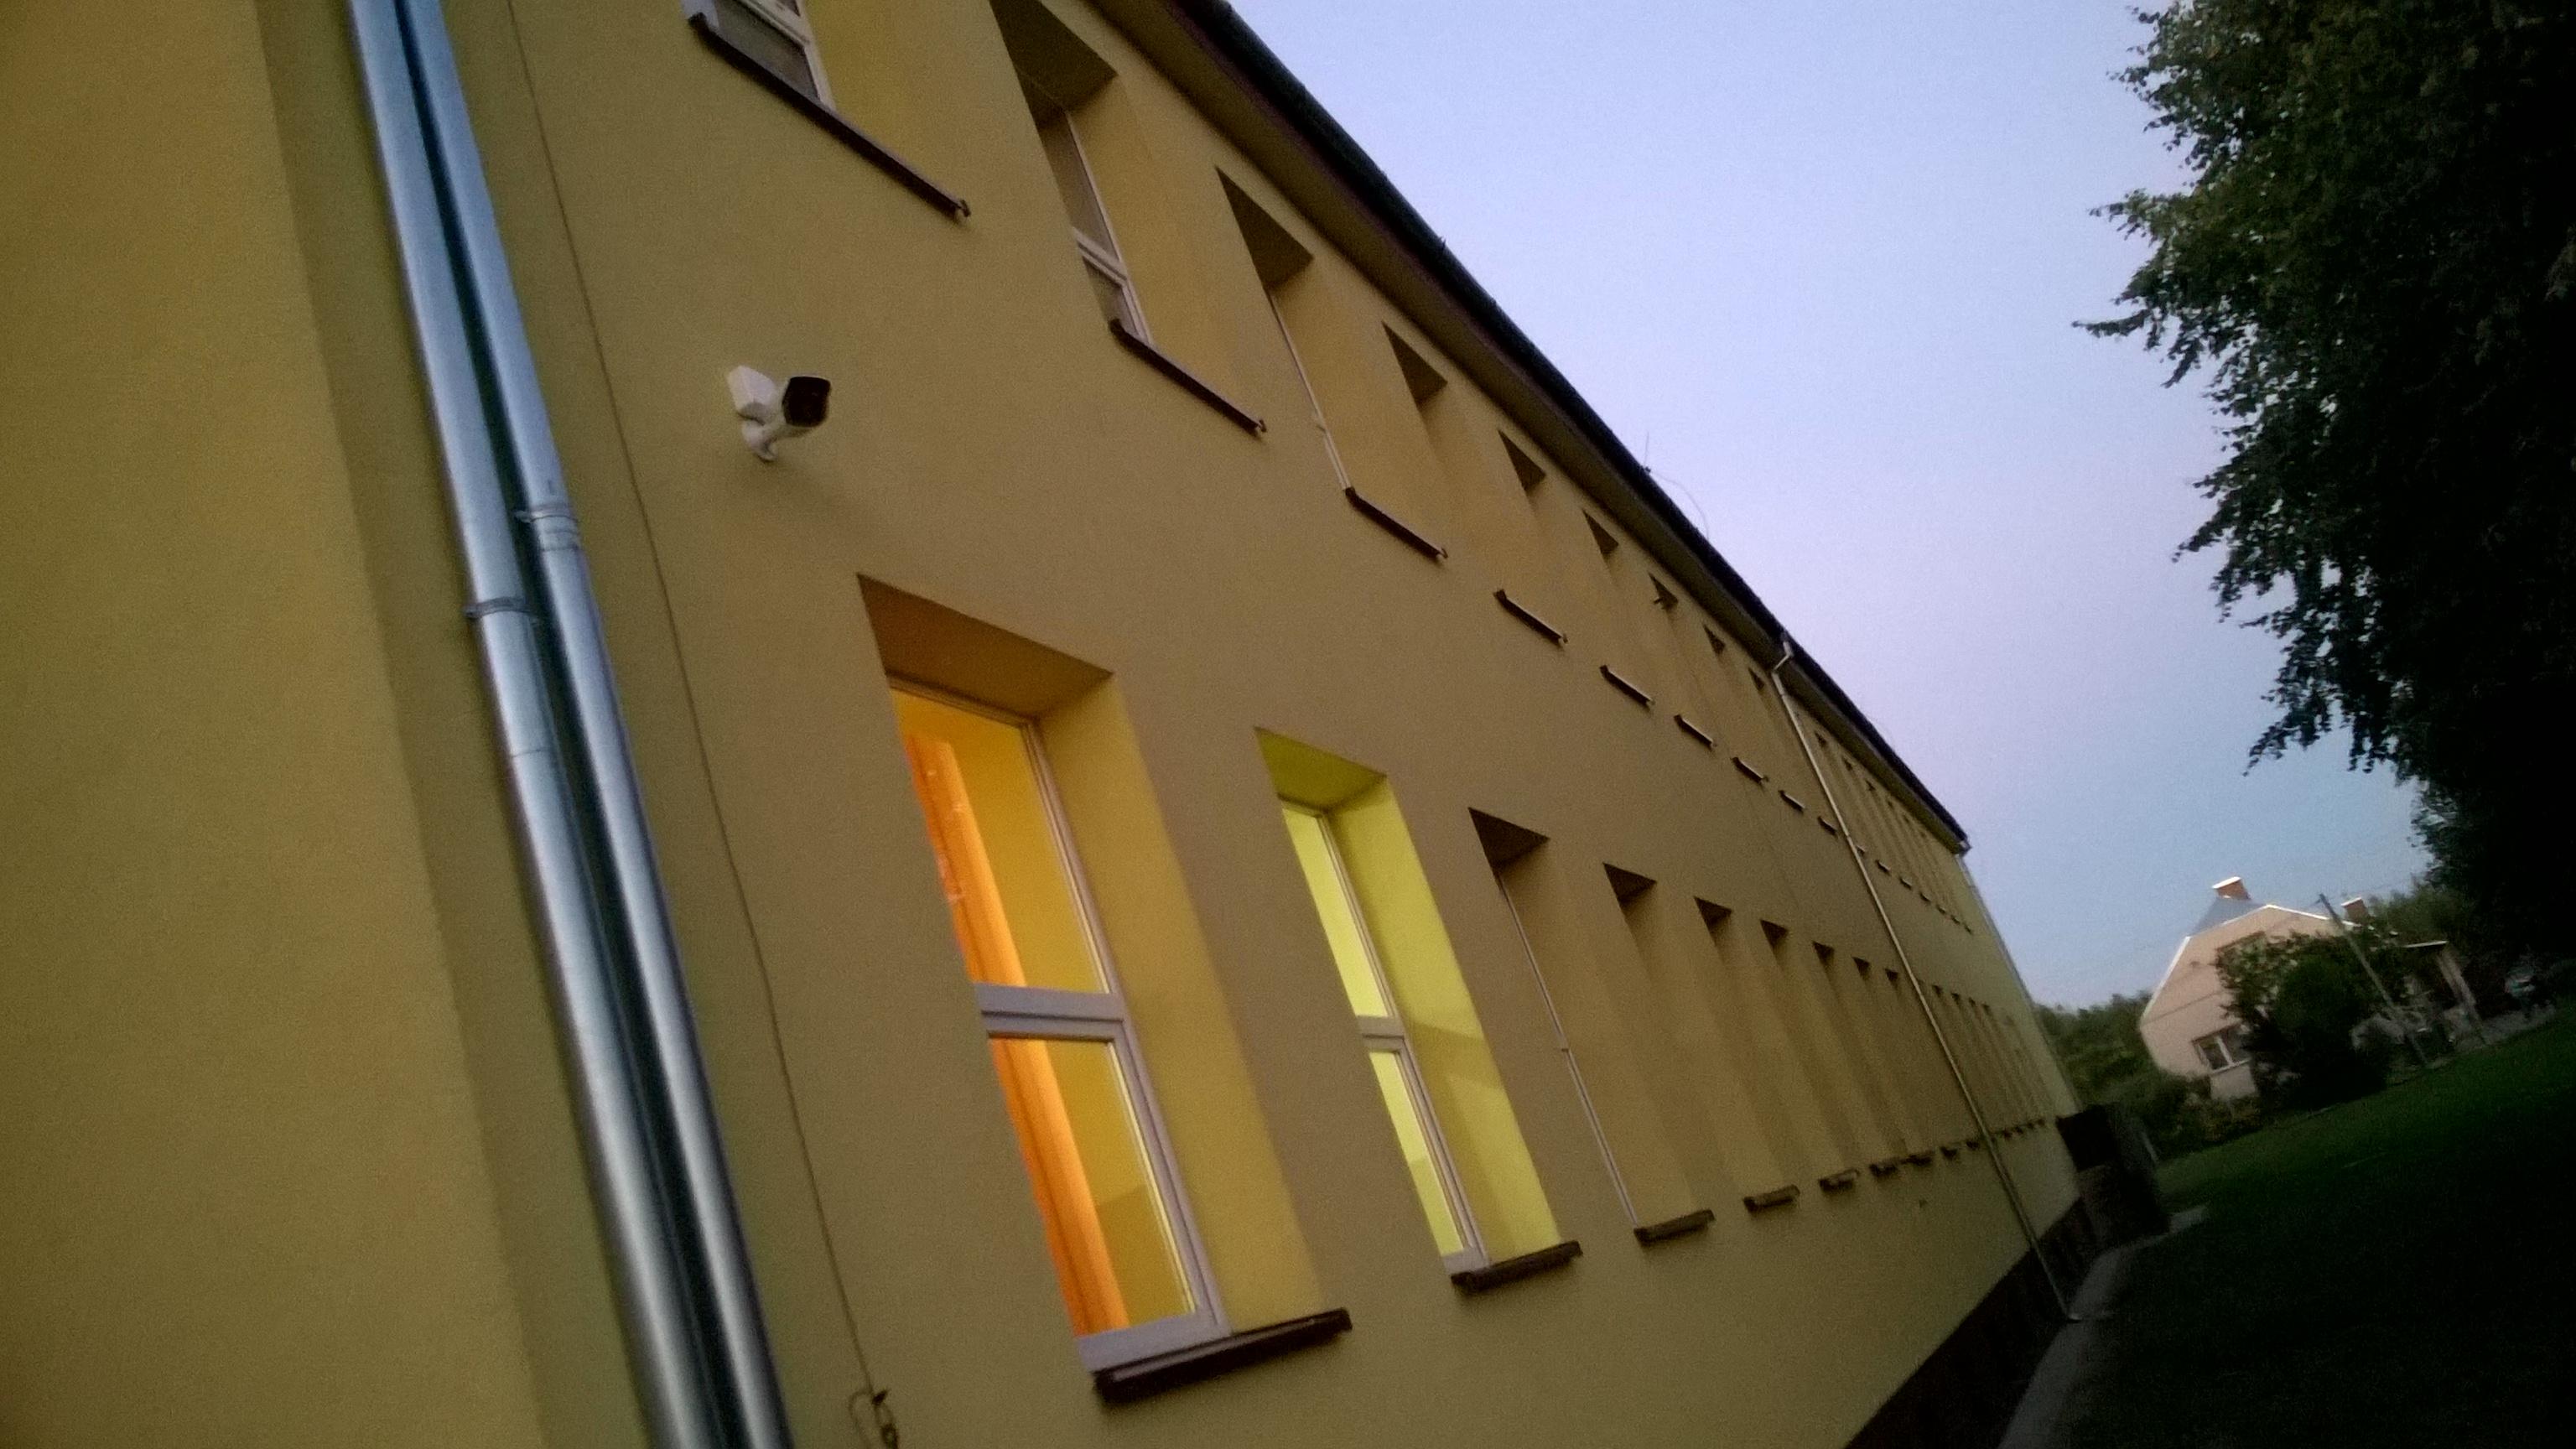 MONITORING CCTV szkoła Kotowa Wola Monitoring budynku szkoły Monitoring Turbo HD HIKVISION - Monitoring Tarnobrzeg